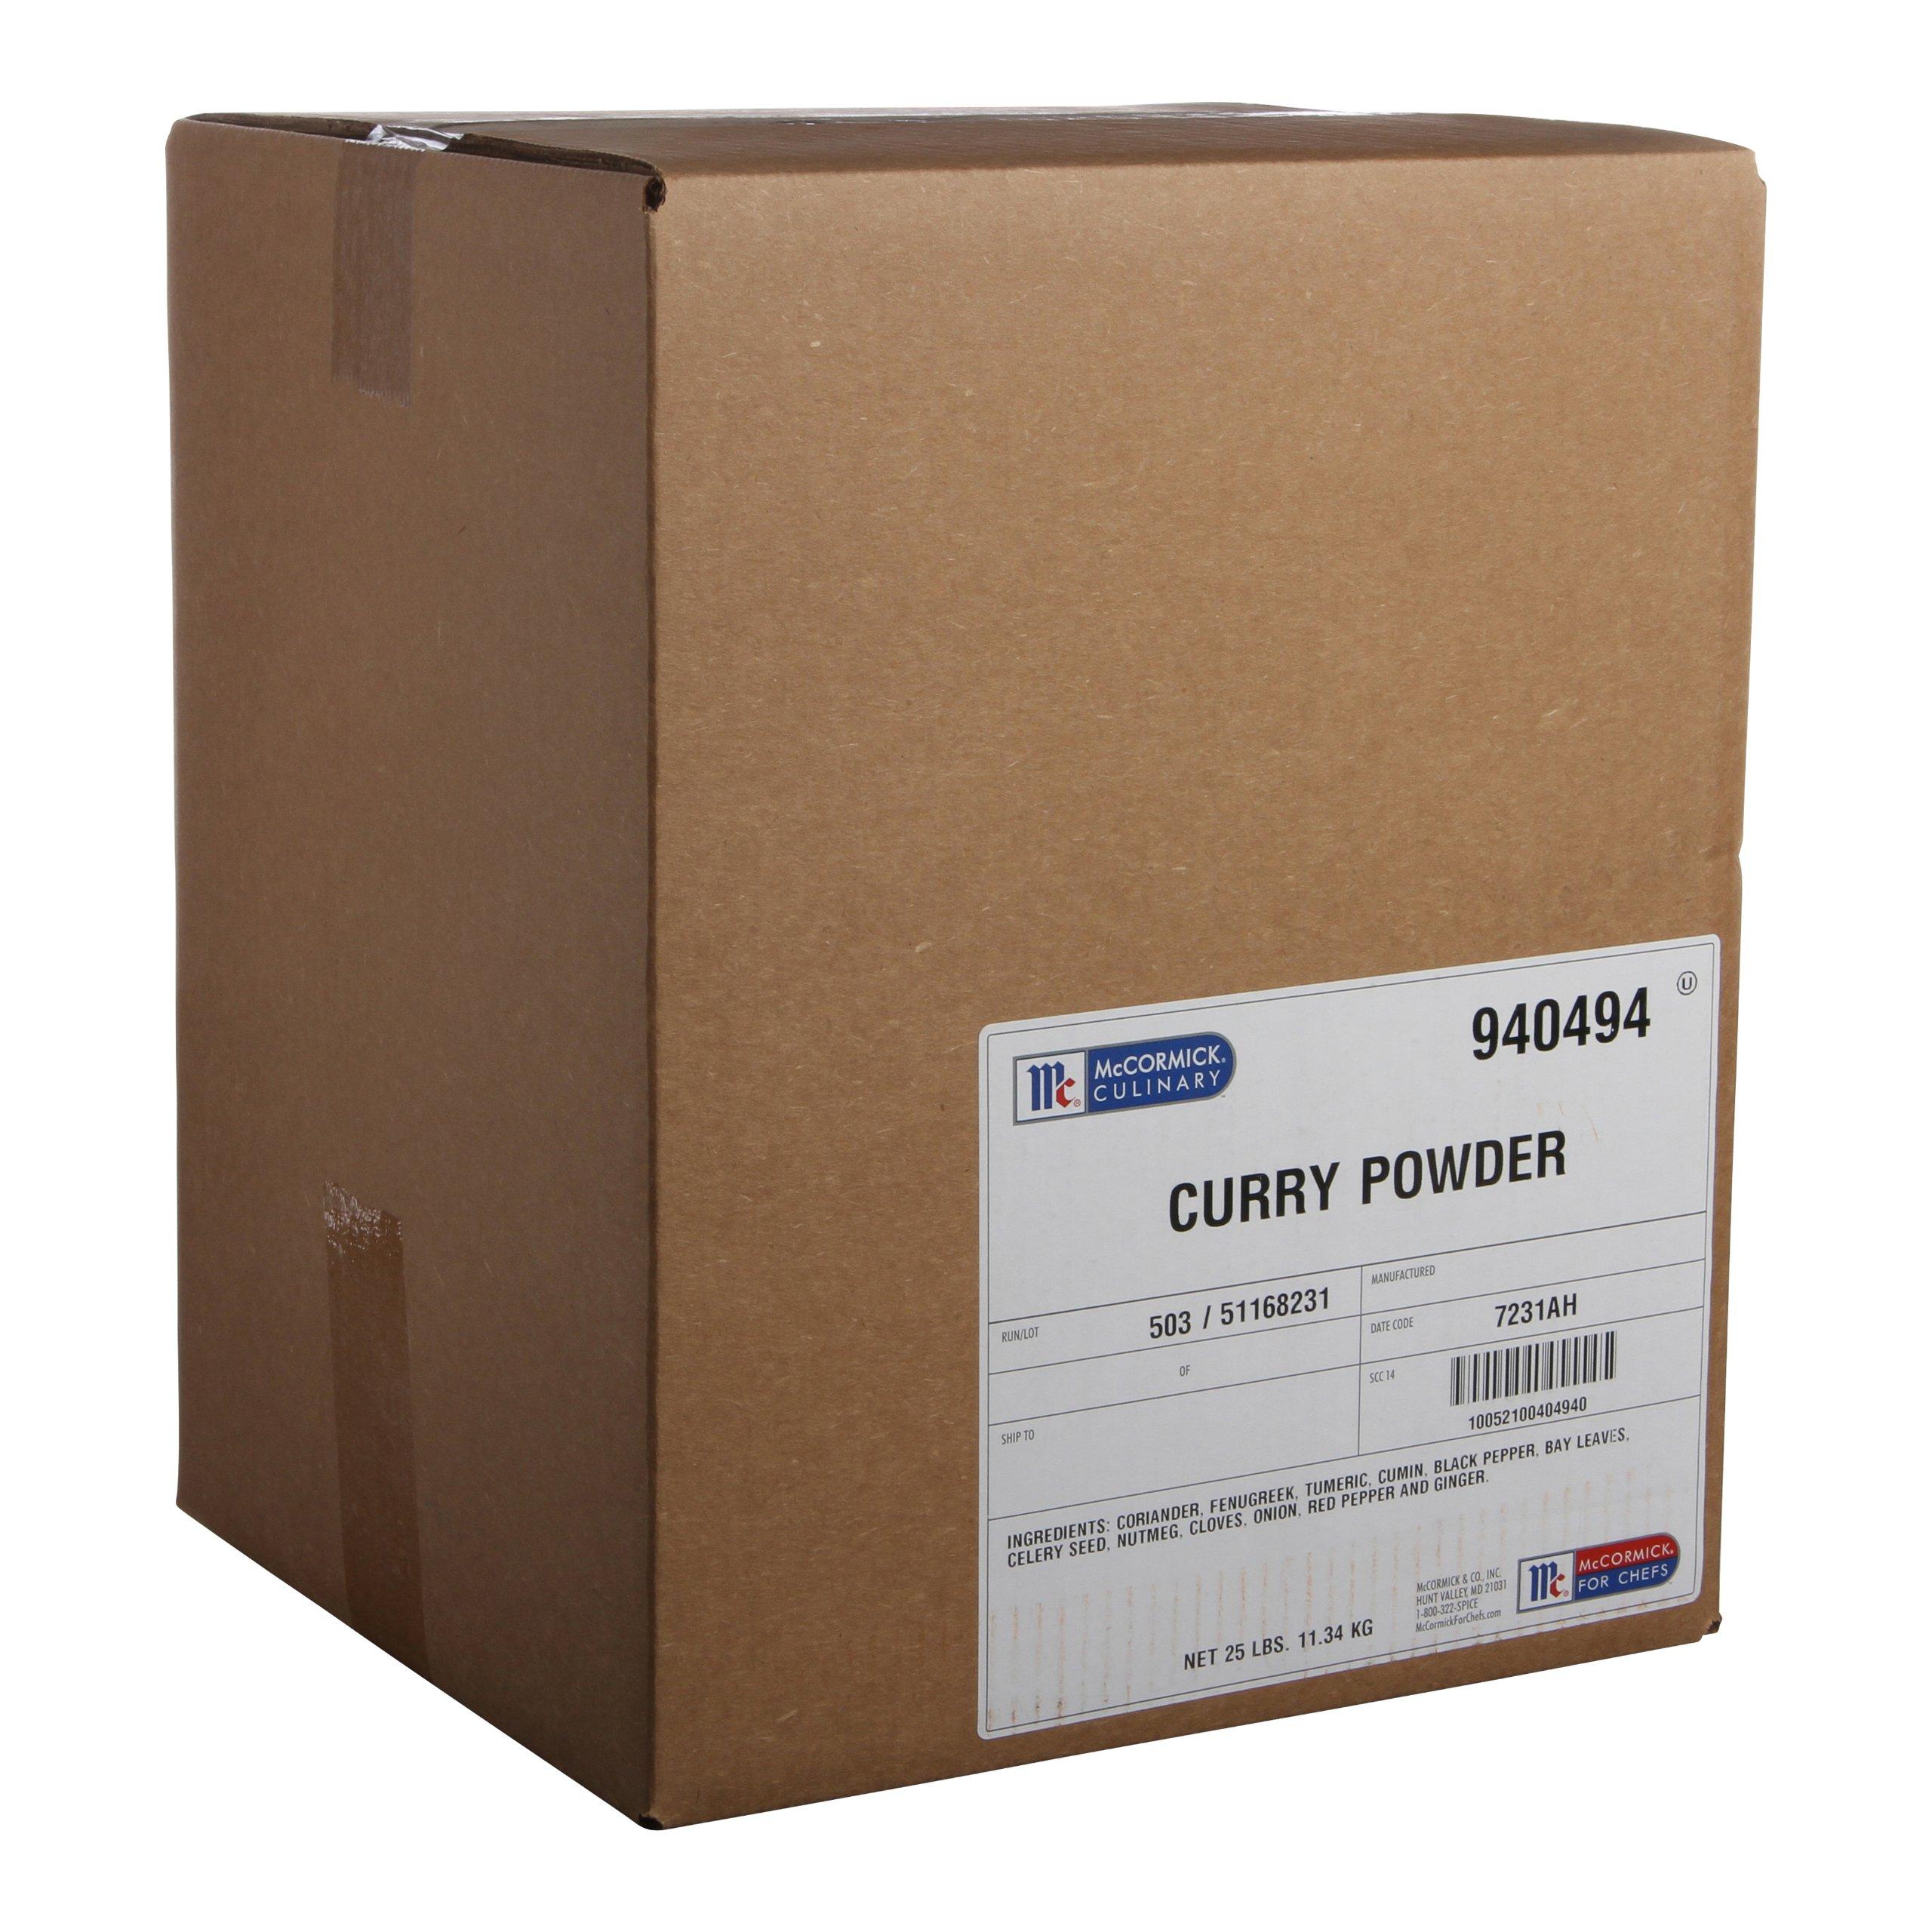 McCormick Culinary Curry Powder, 25 lbs